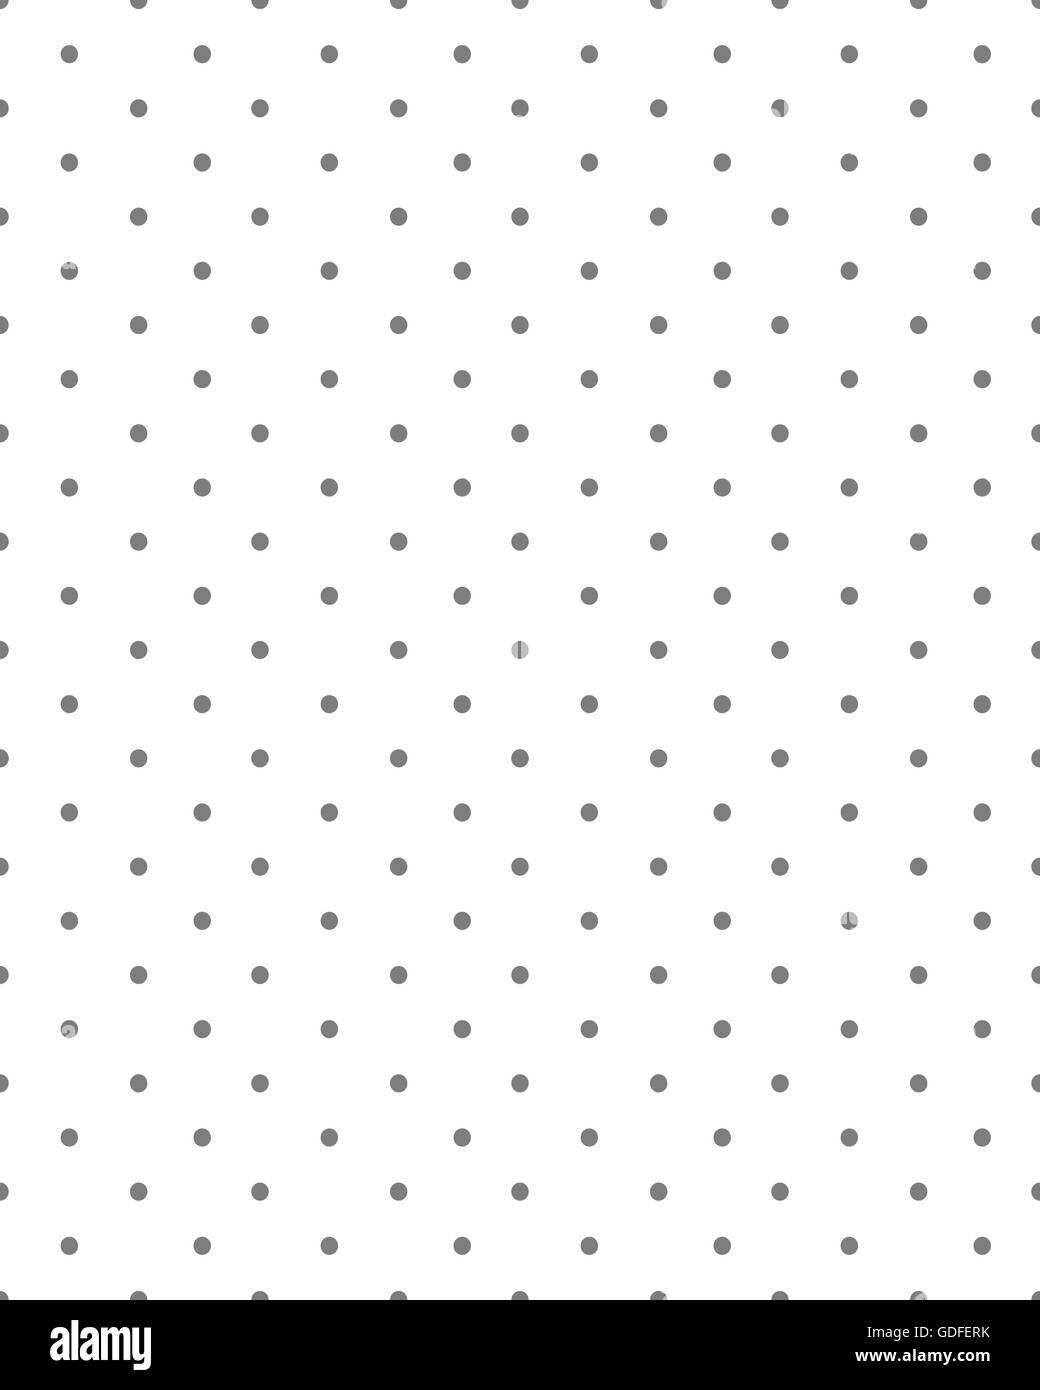 Dots Template Stock Photos & Dots Template Stock Images - Alamy